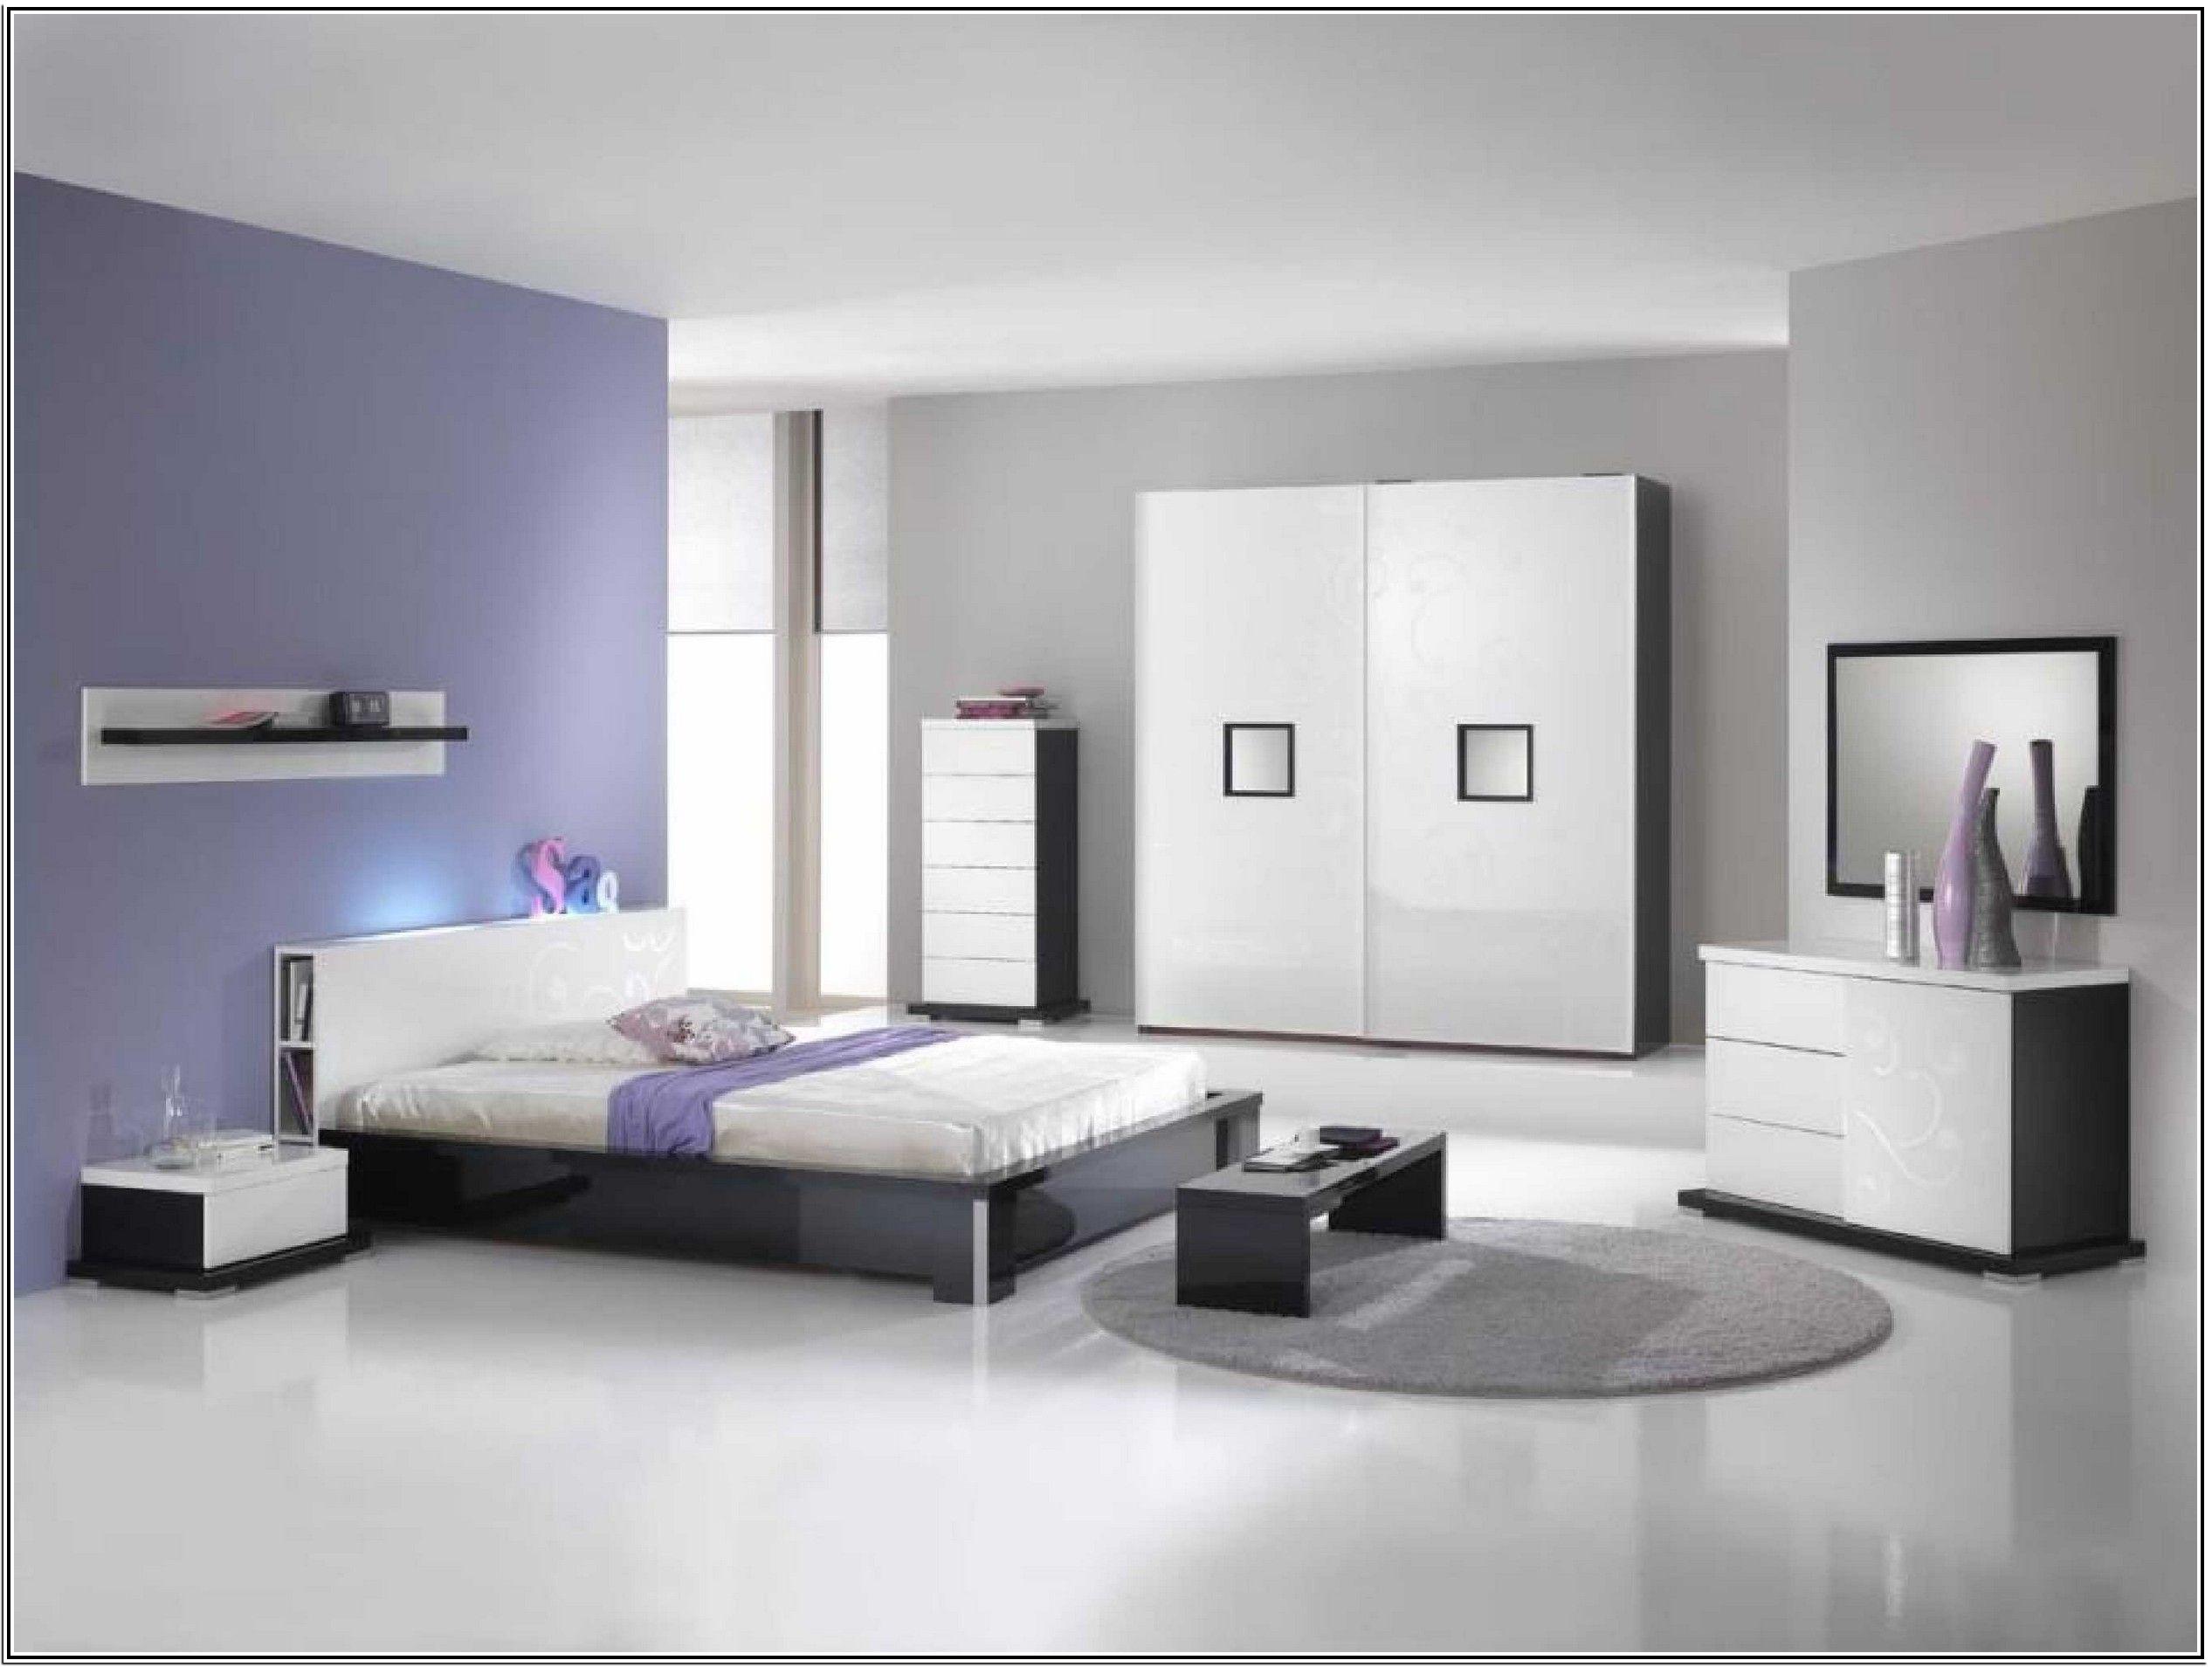 Bedroom Furniture Design Ideas Elegant Bedroom Dressers  Design Ideas 20172018  Pinterest